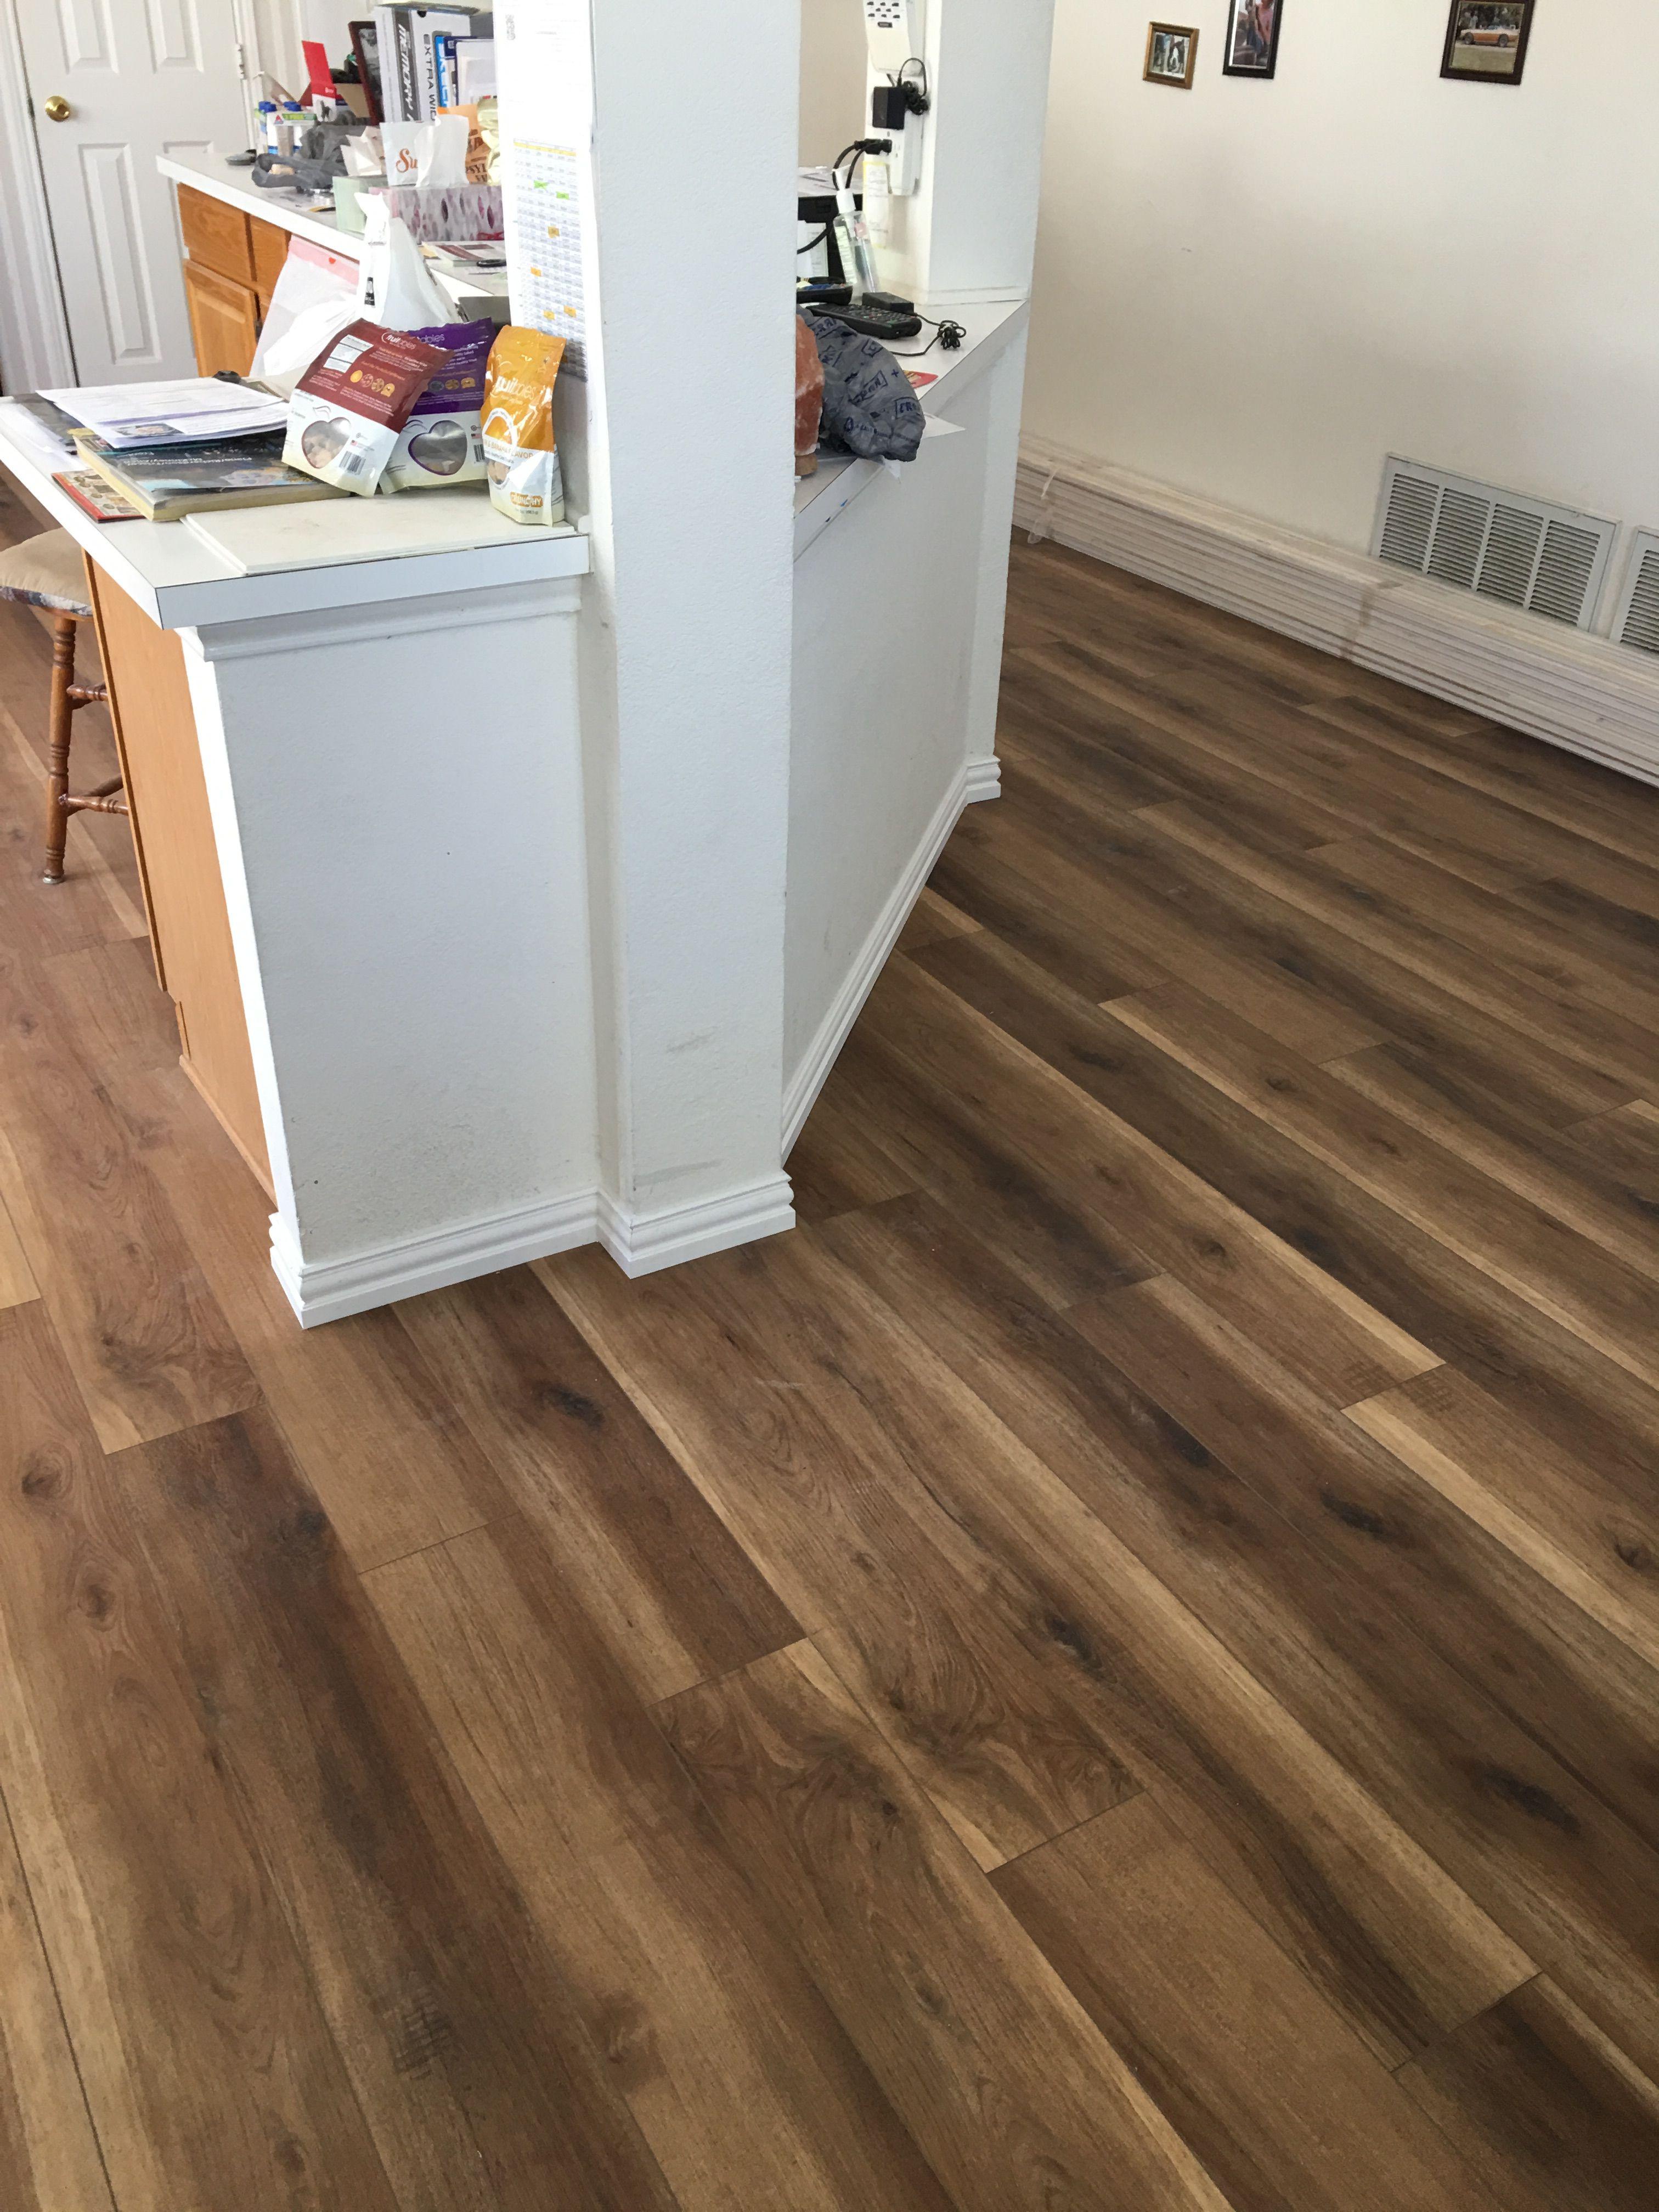 Coretec Plus 5 Plank Brockport Oak Vv023 00513 Wpc Vinyl Flooring Swatch In 2020 Vinyl Flooring Kitchen Vinyl Flooring Flooring